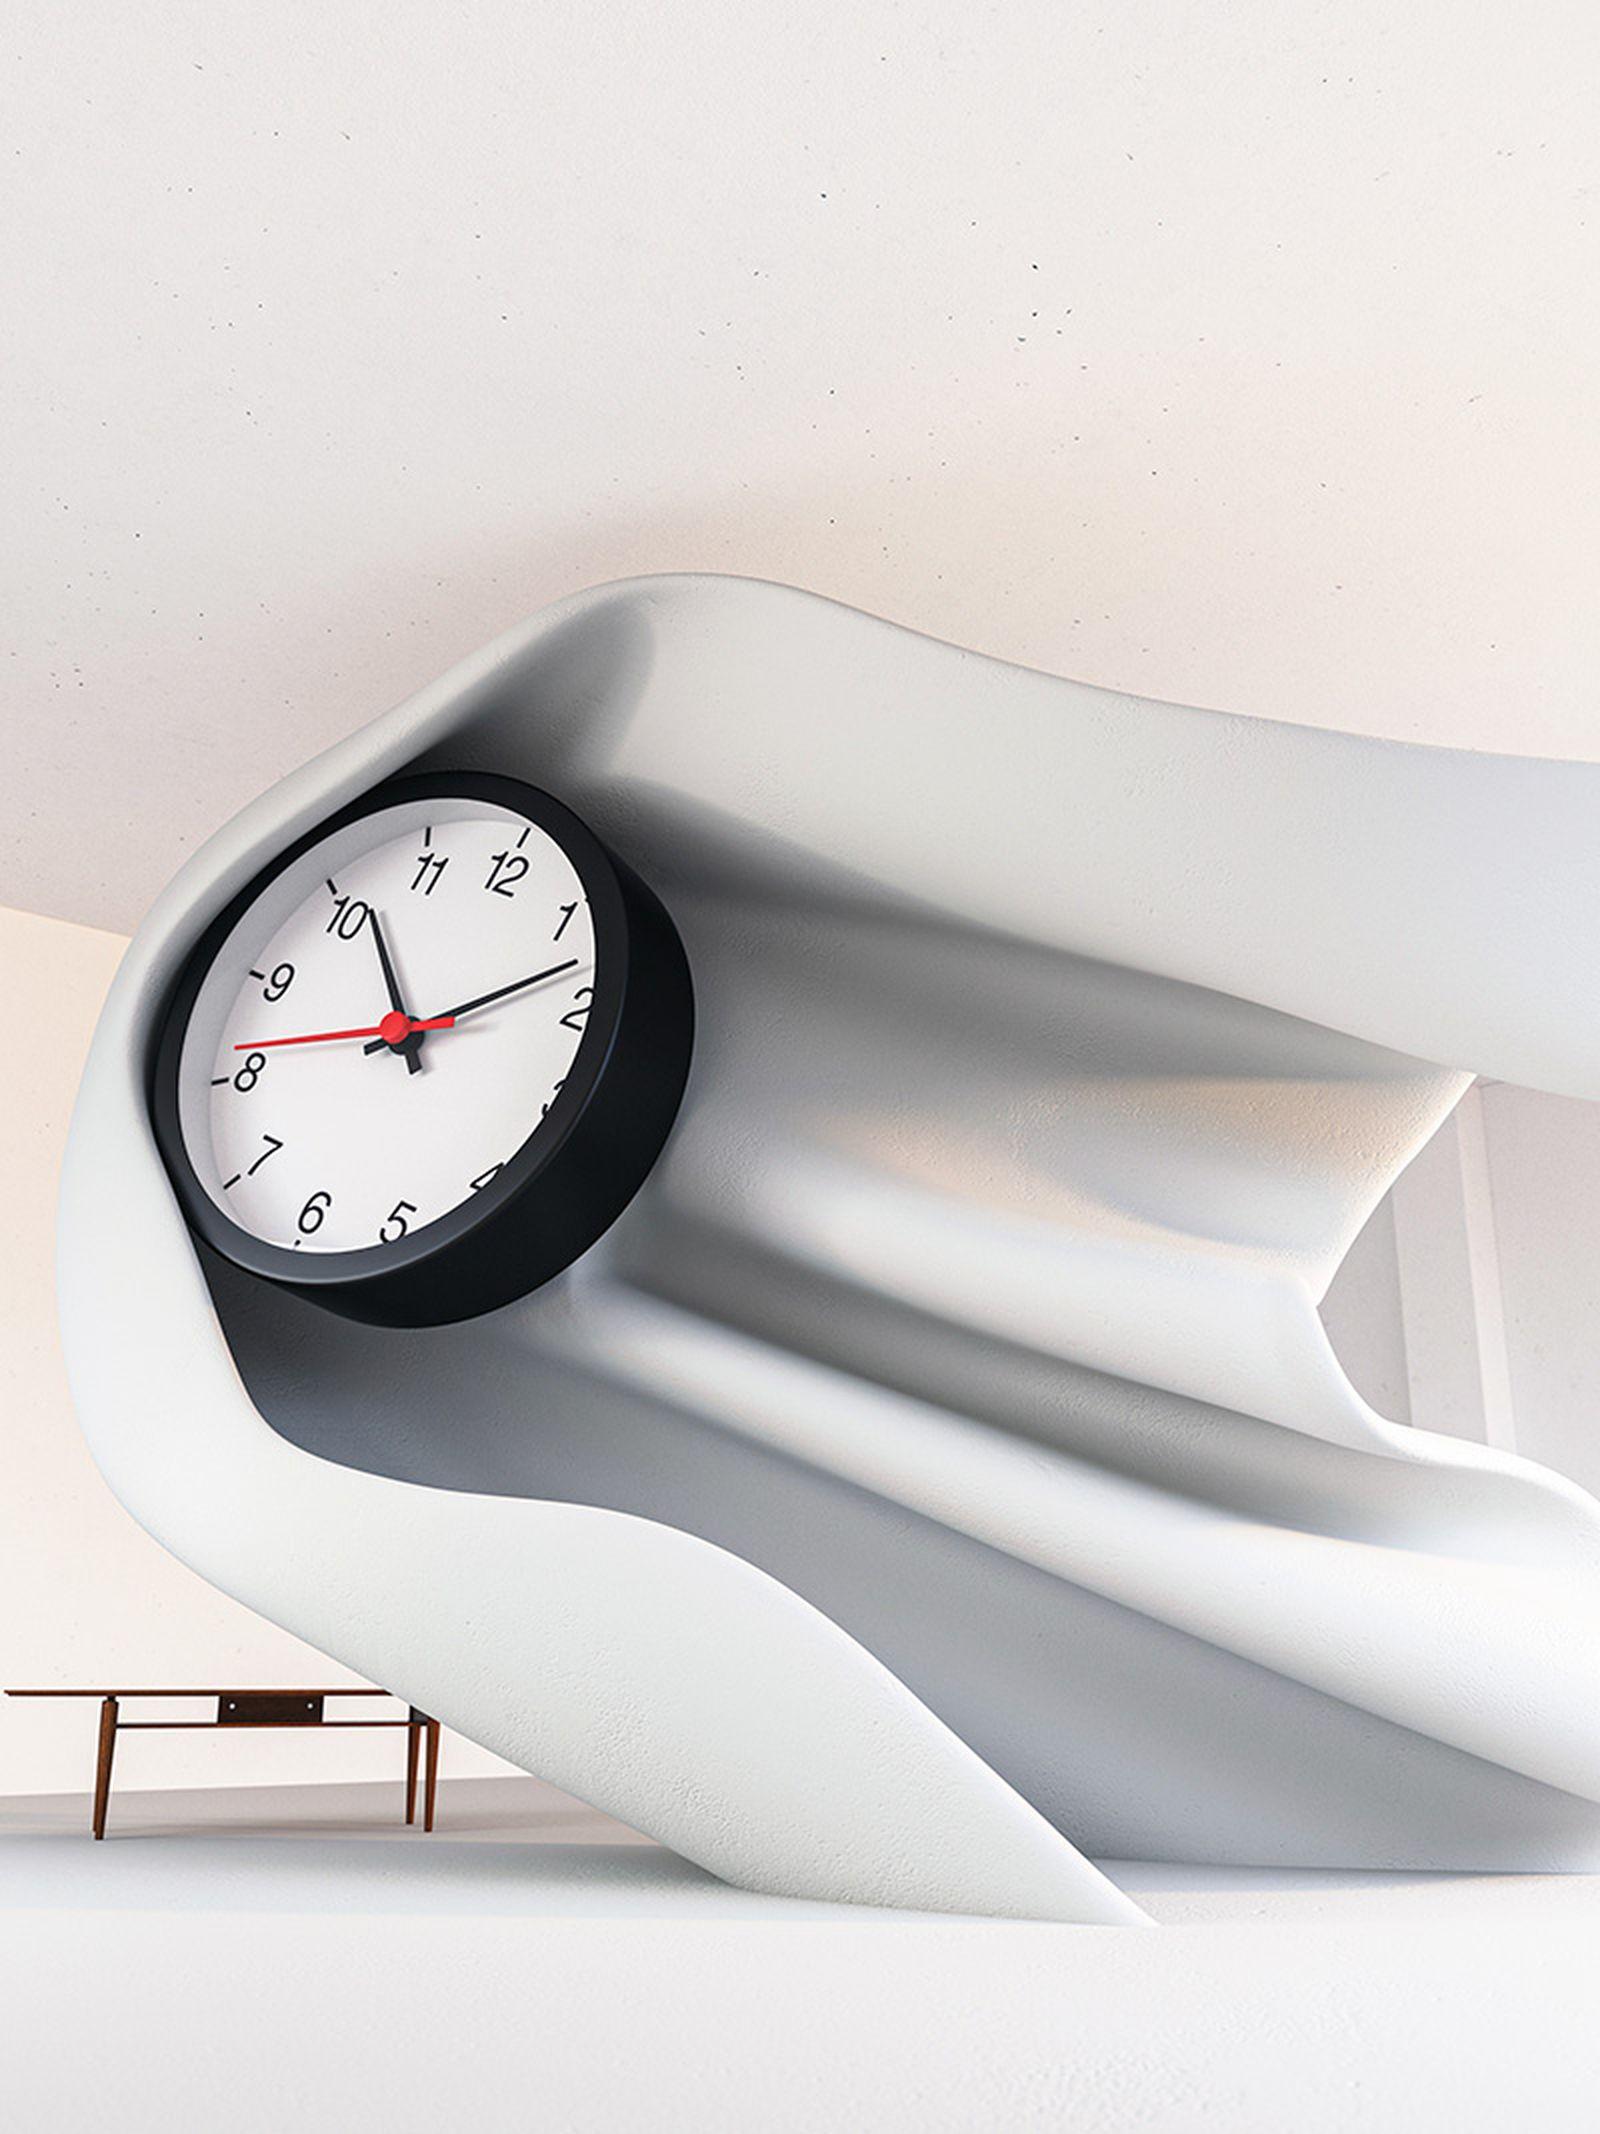 IKEA ART EVENT 2021 clock by Daniel Arsham